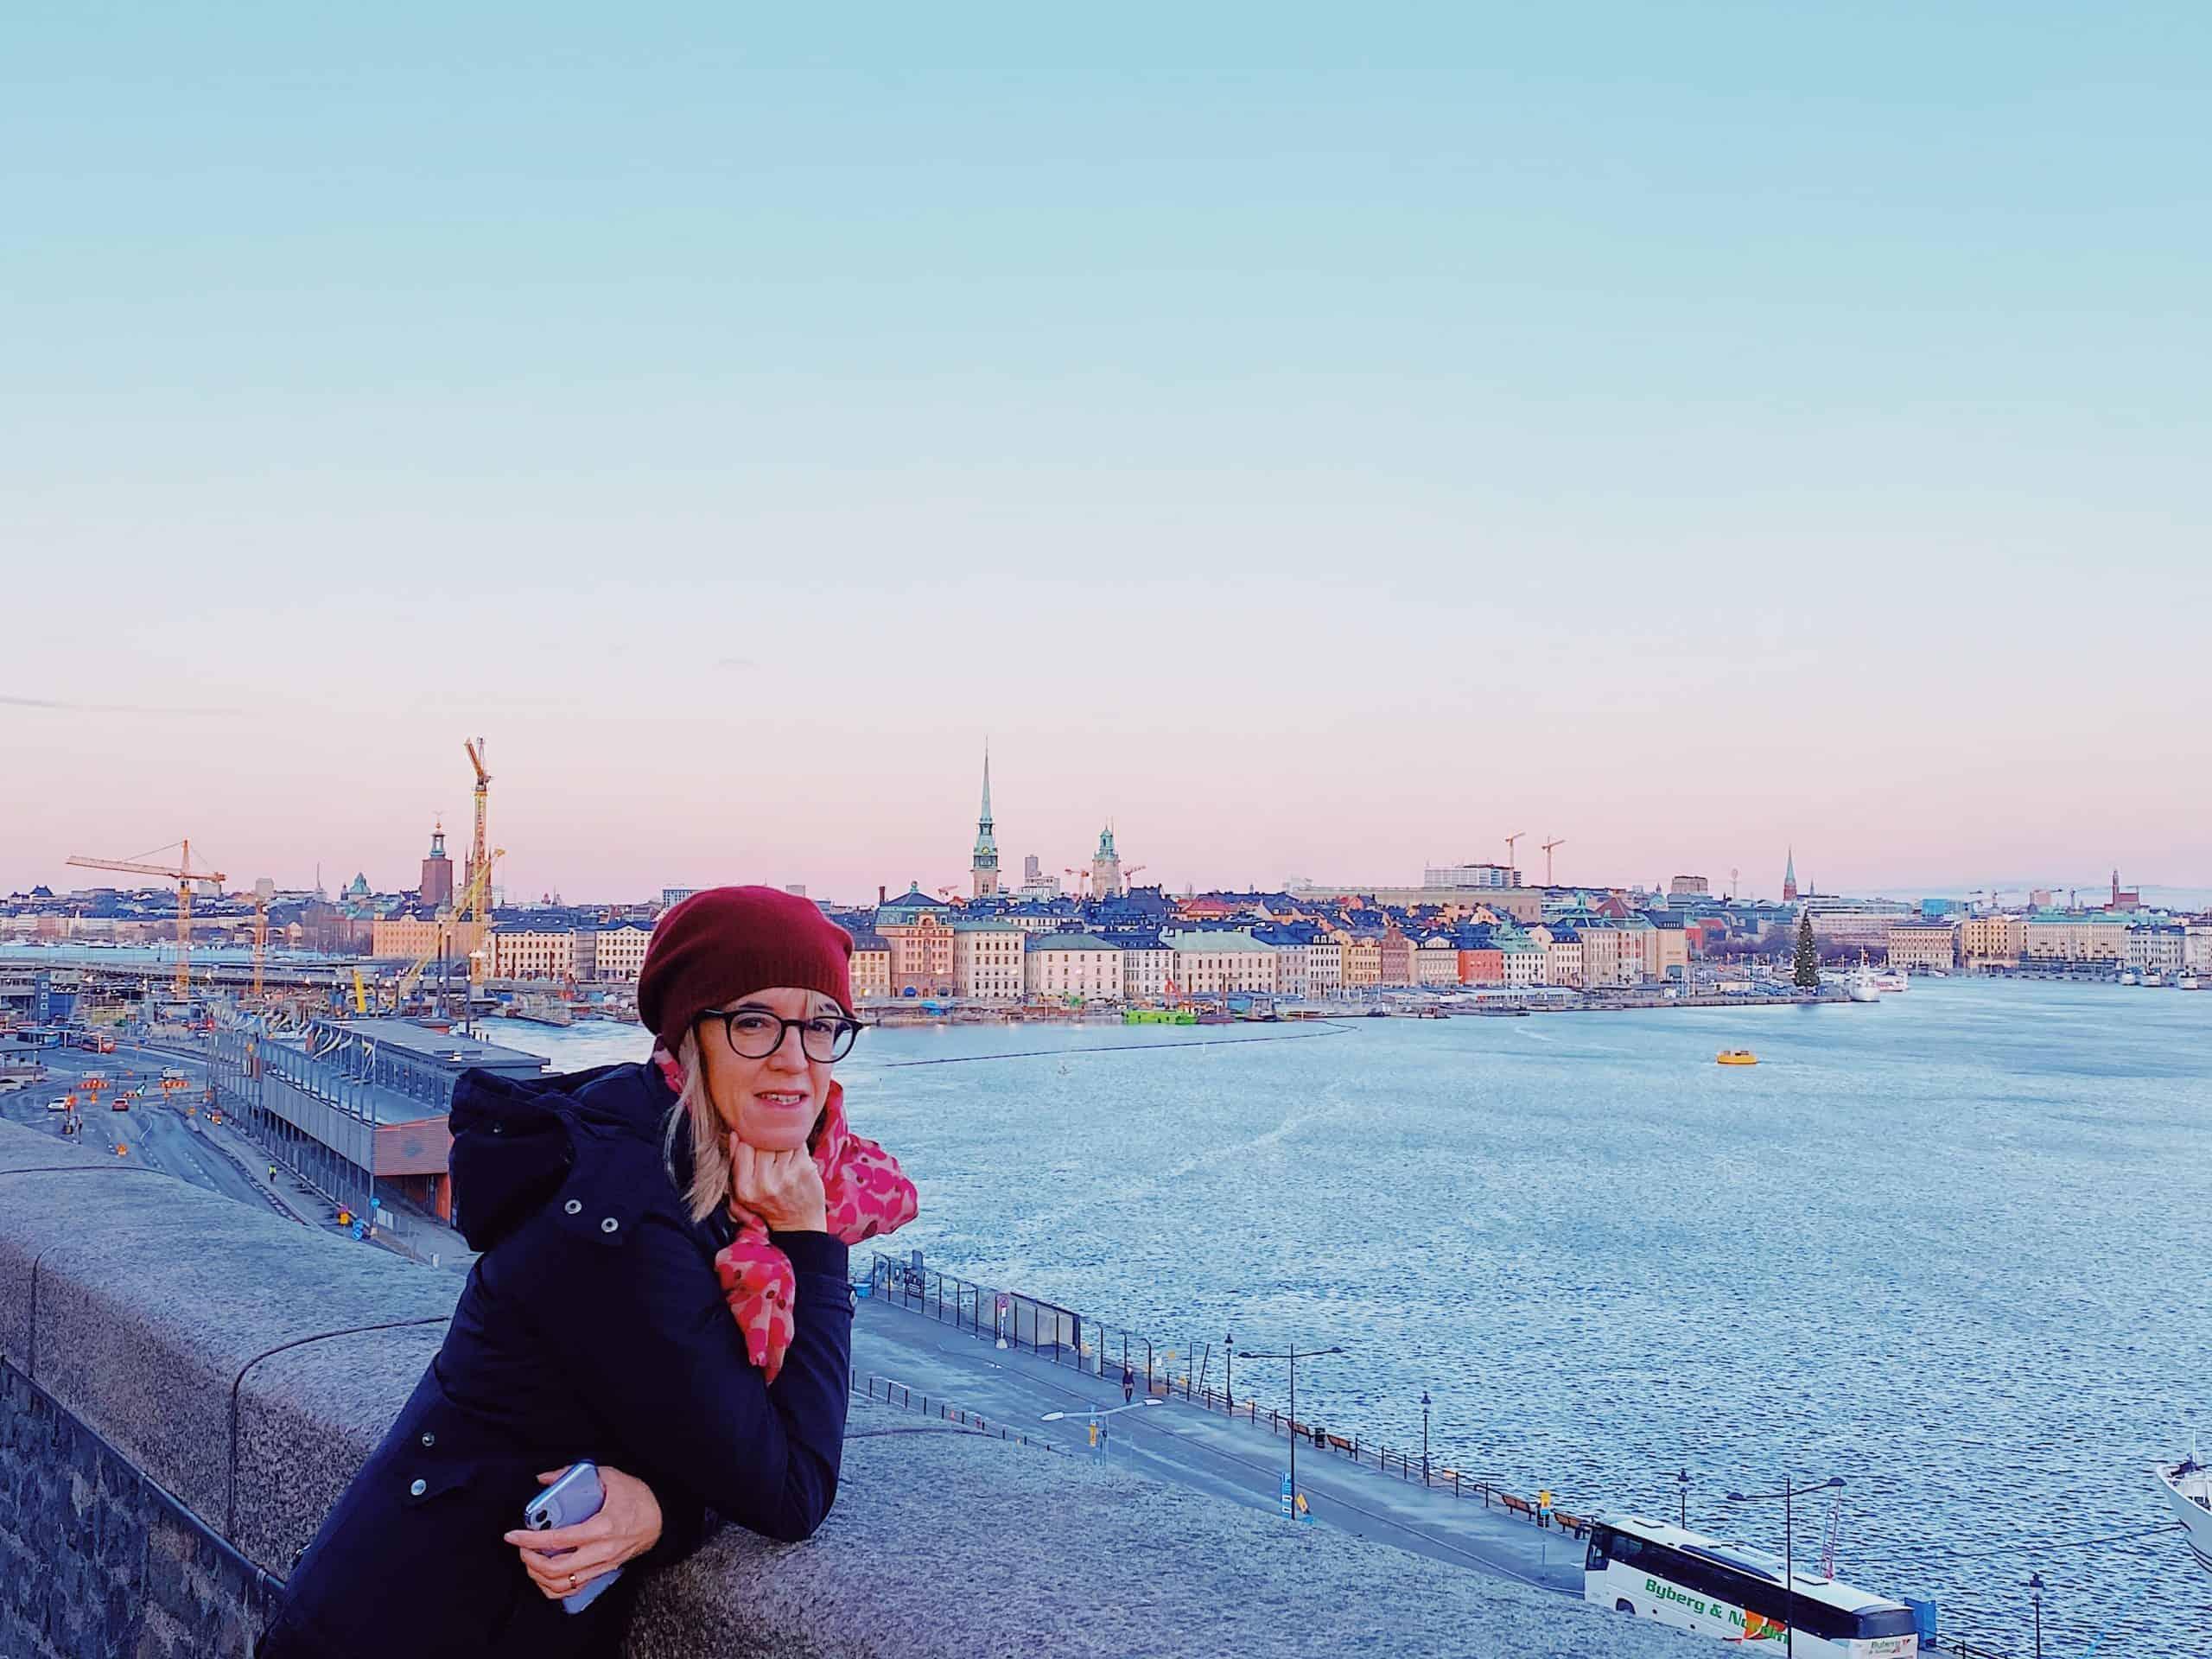 Vista panoramica di Stoccolma in Svezia